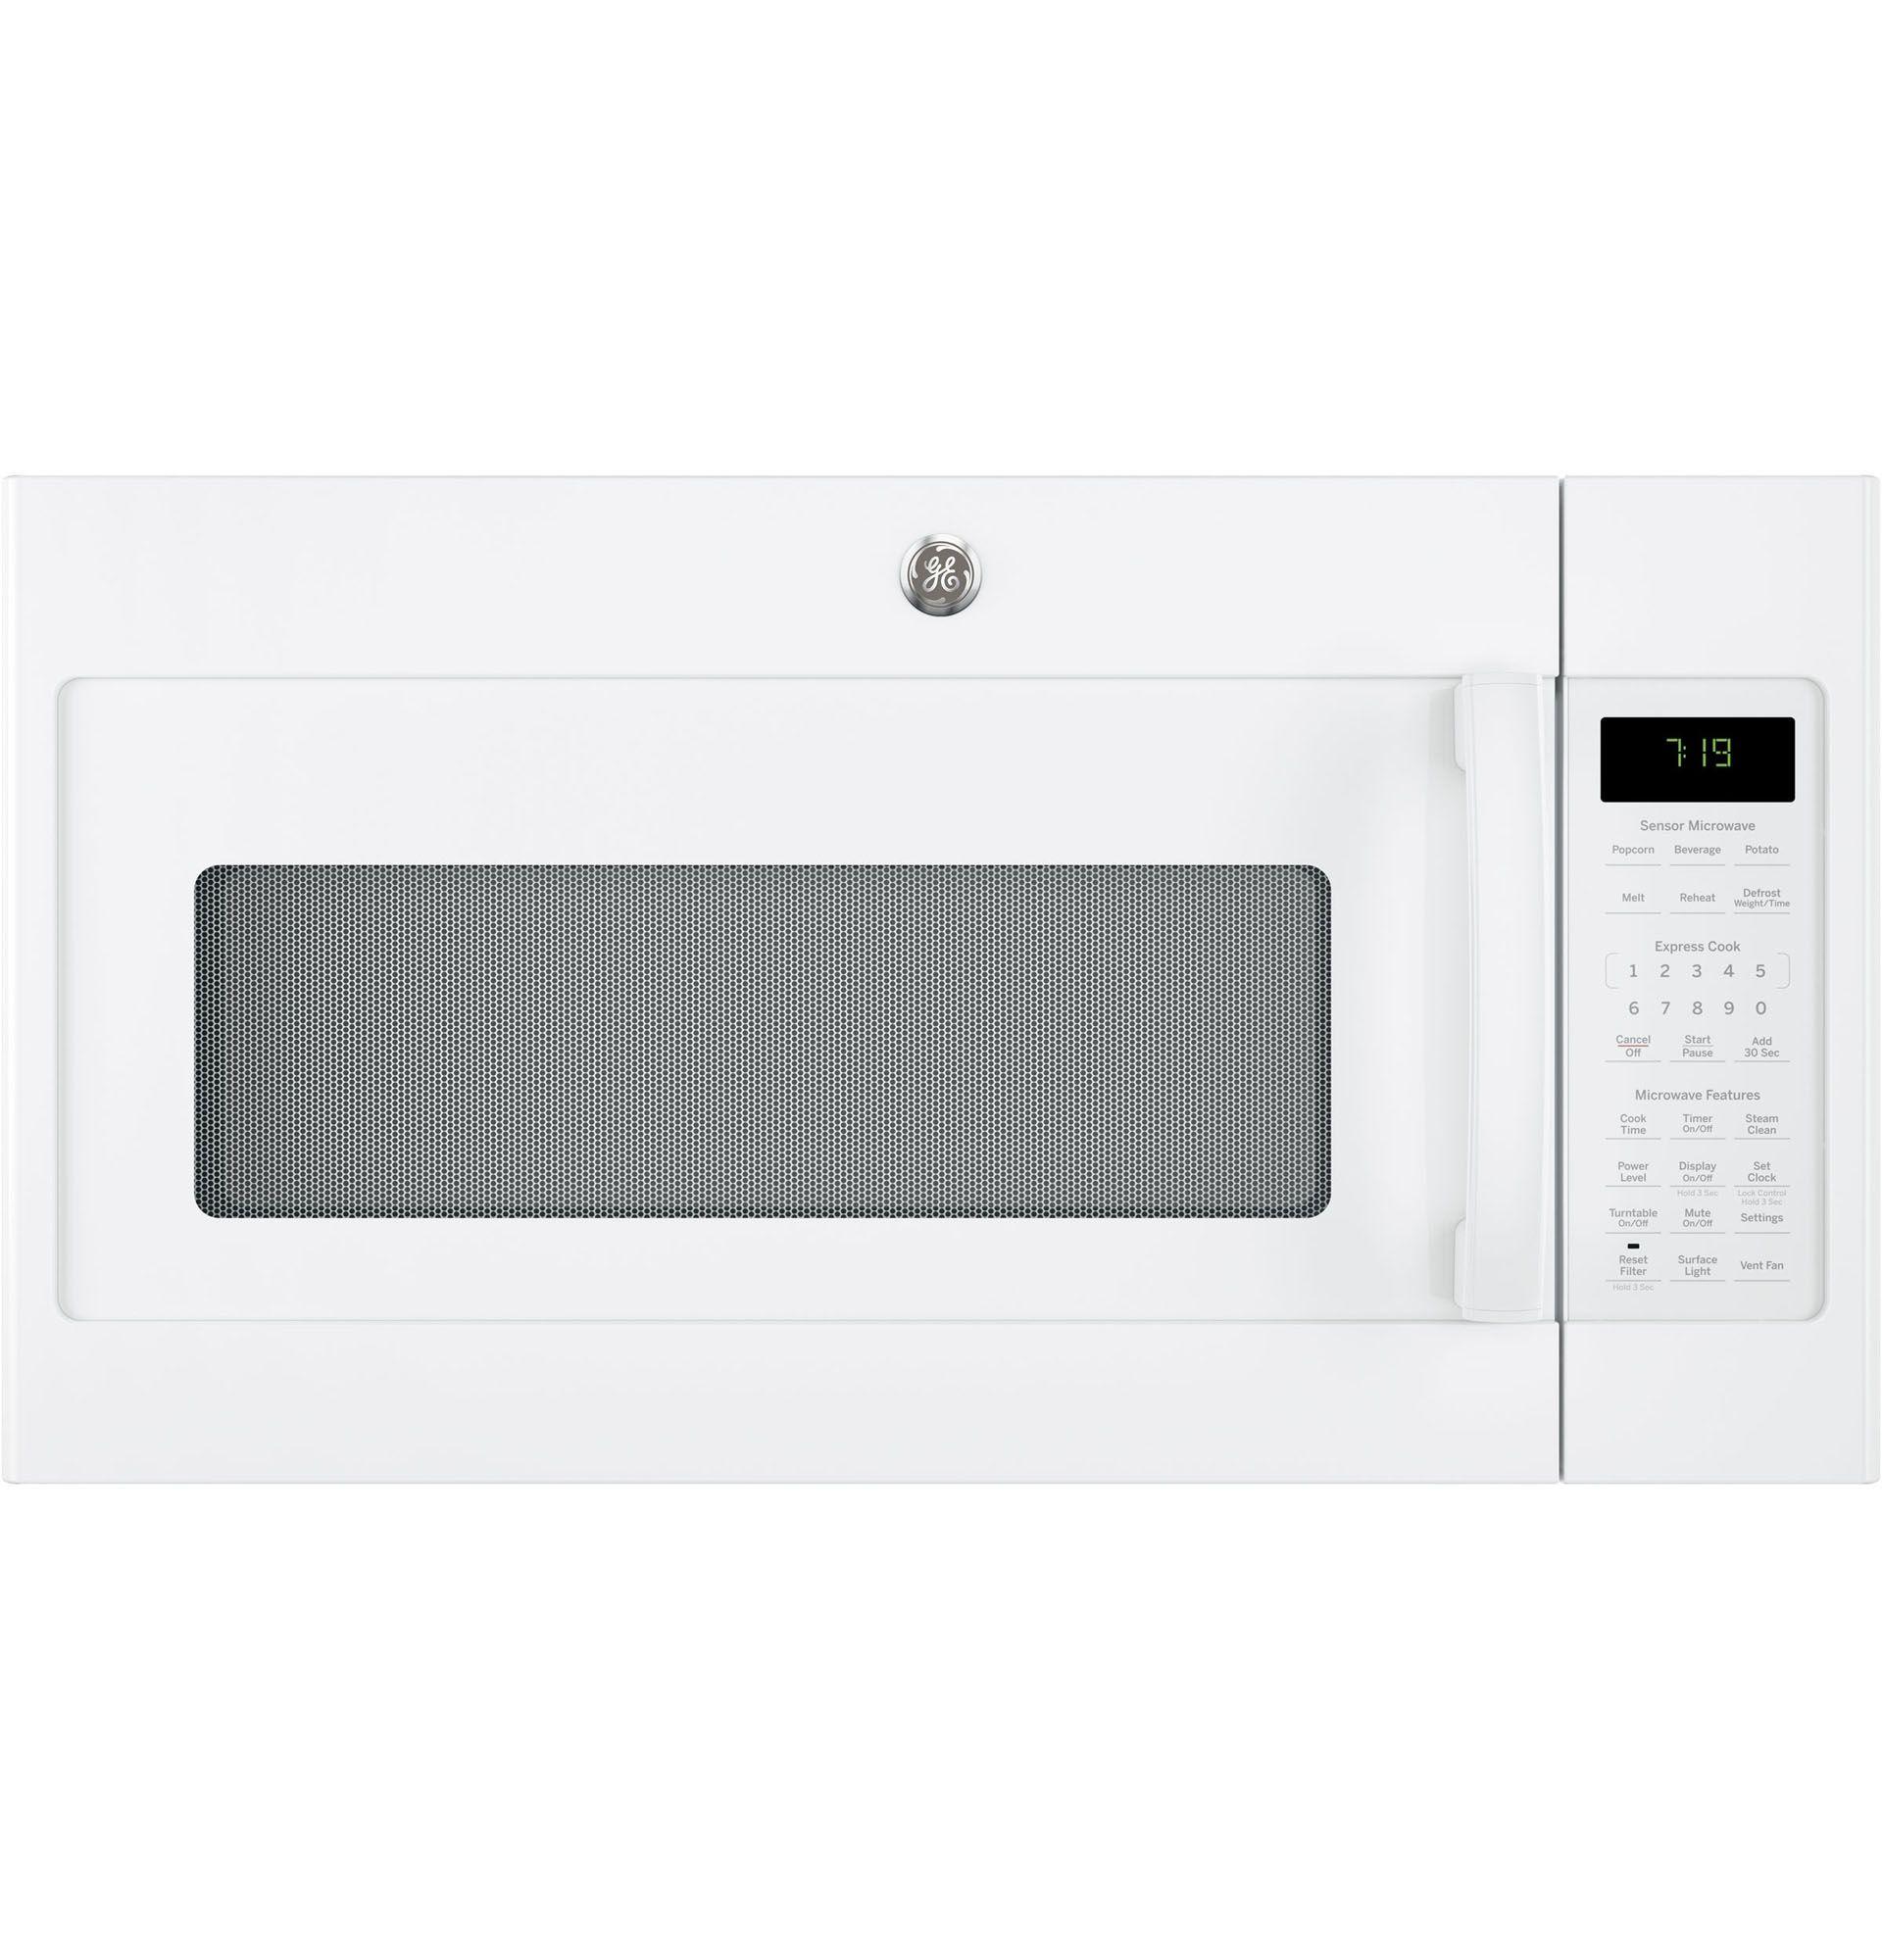 Ge Jnm7196dkww 1 9 Cu Ft Over The Range Microwave White Range Microwave Microwave Microwave Oven